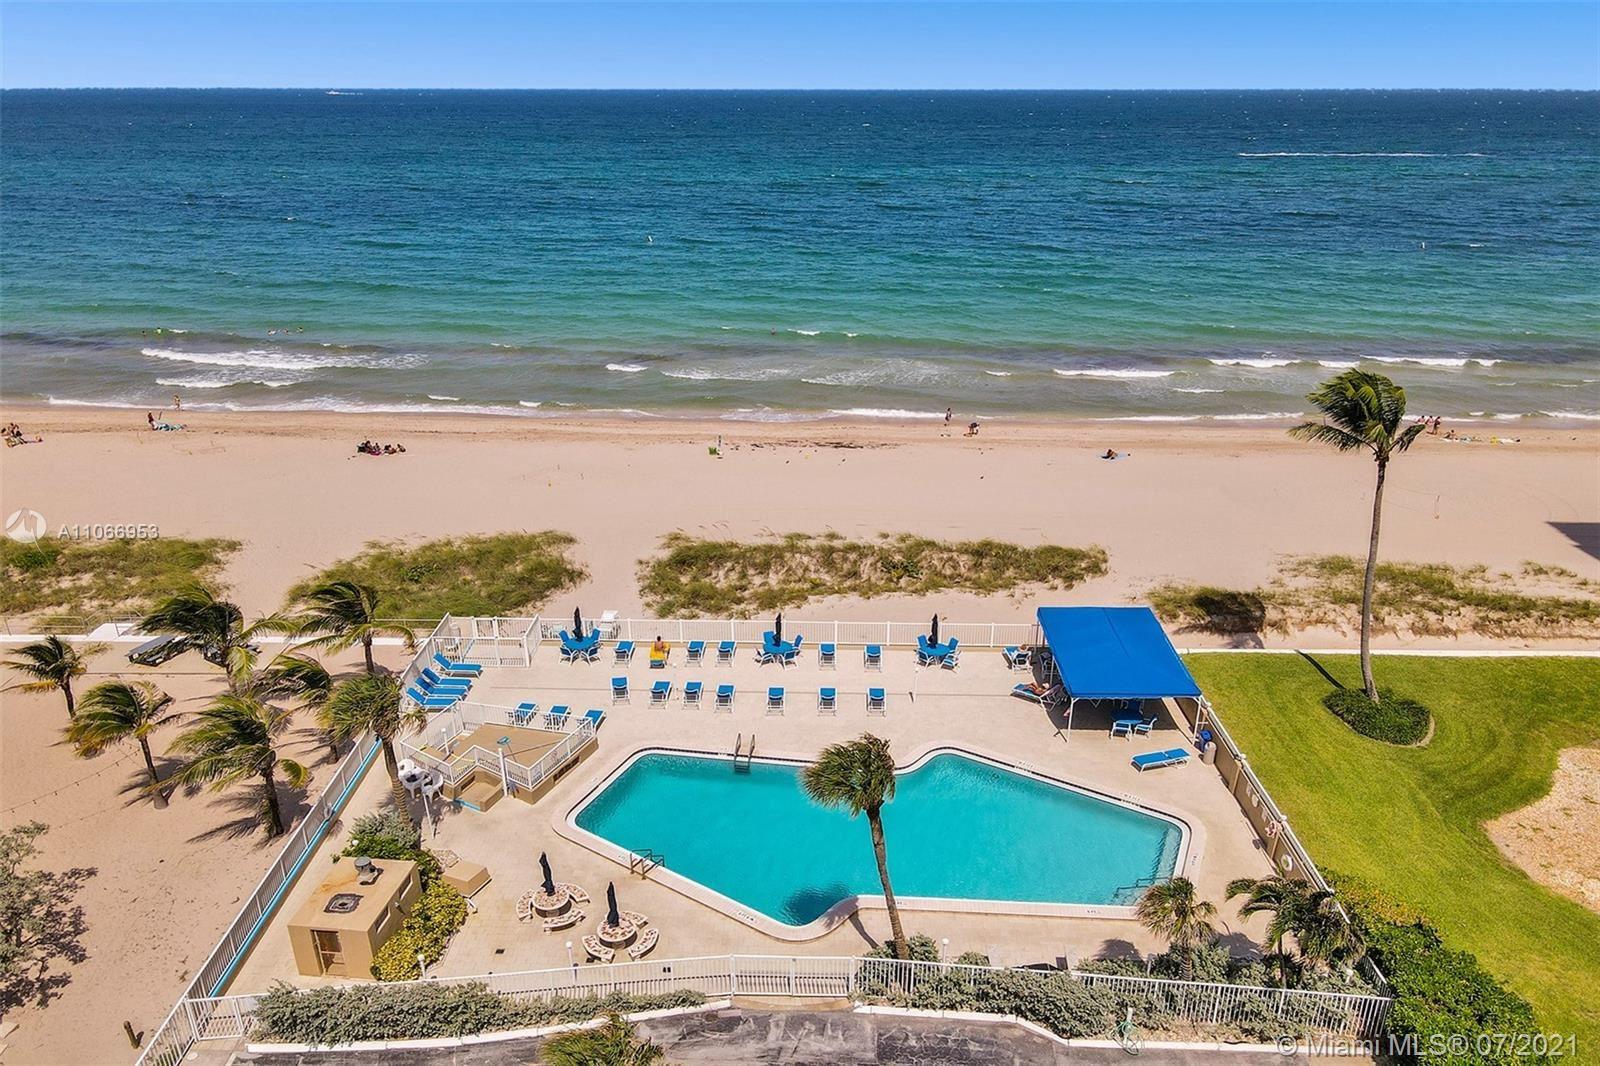 Photo of 4050 N Ocean Dr #1103, Lauderdale By The Sea, FL 33308 (MLS # A11066953)